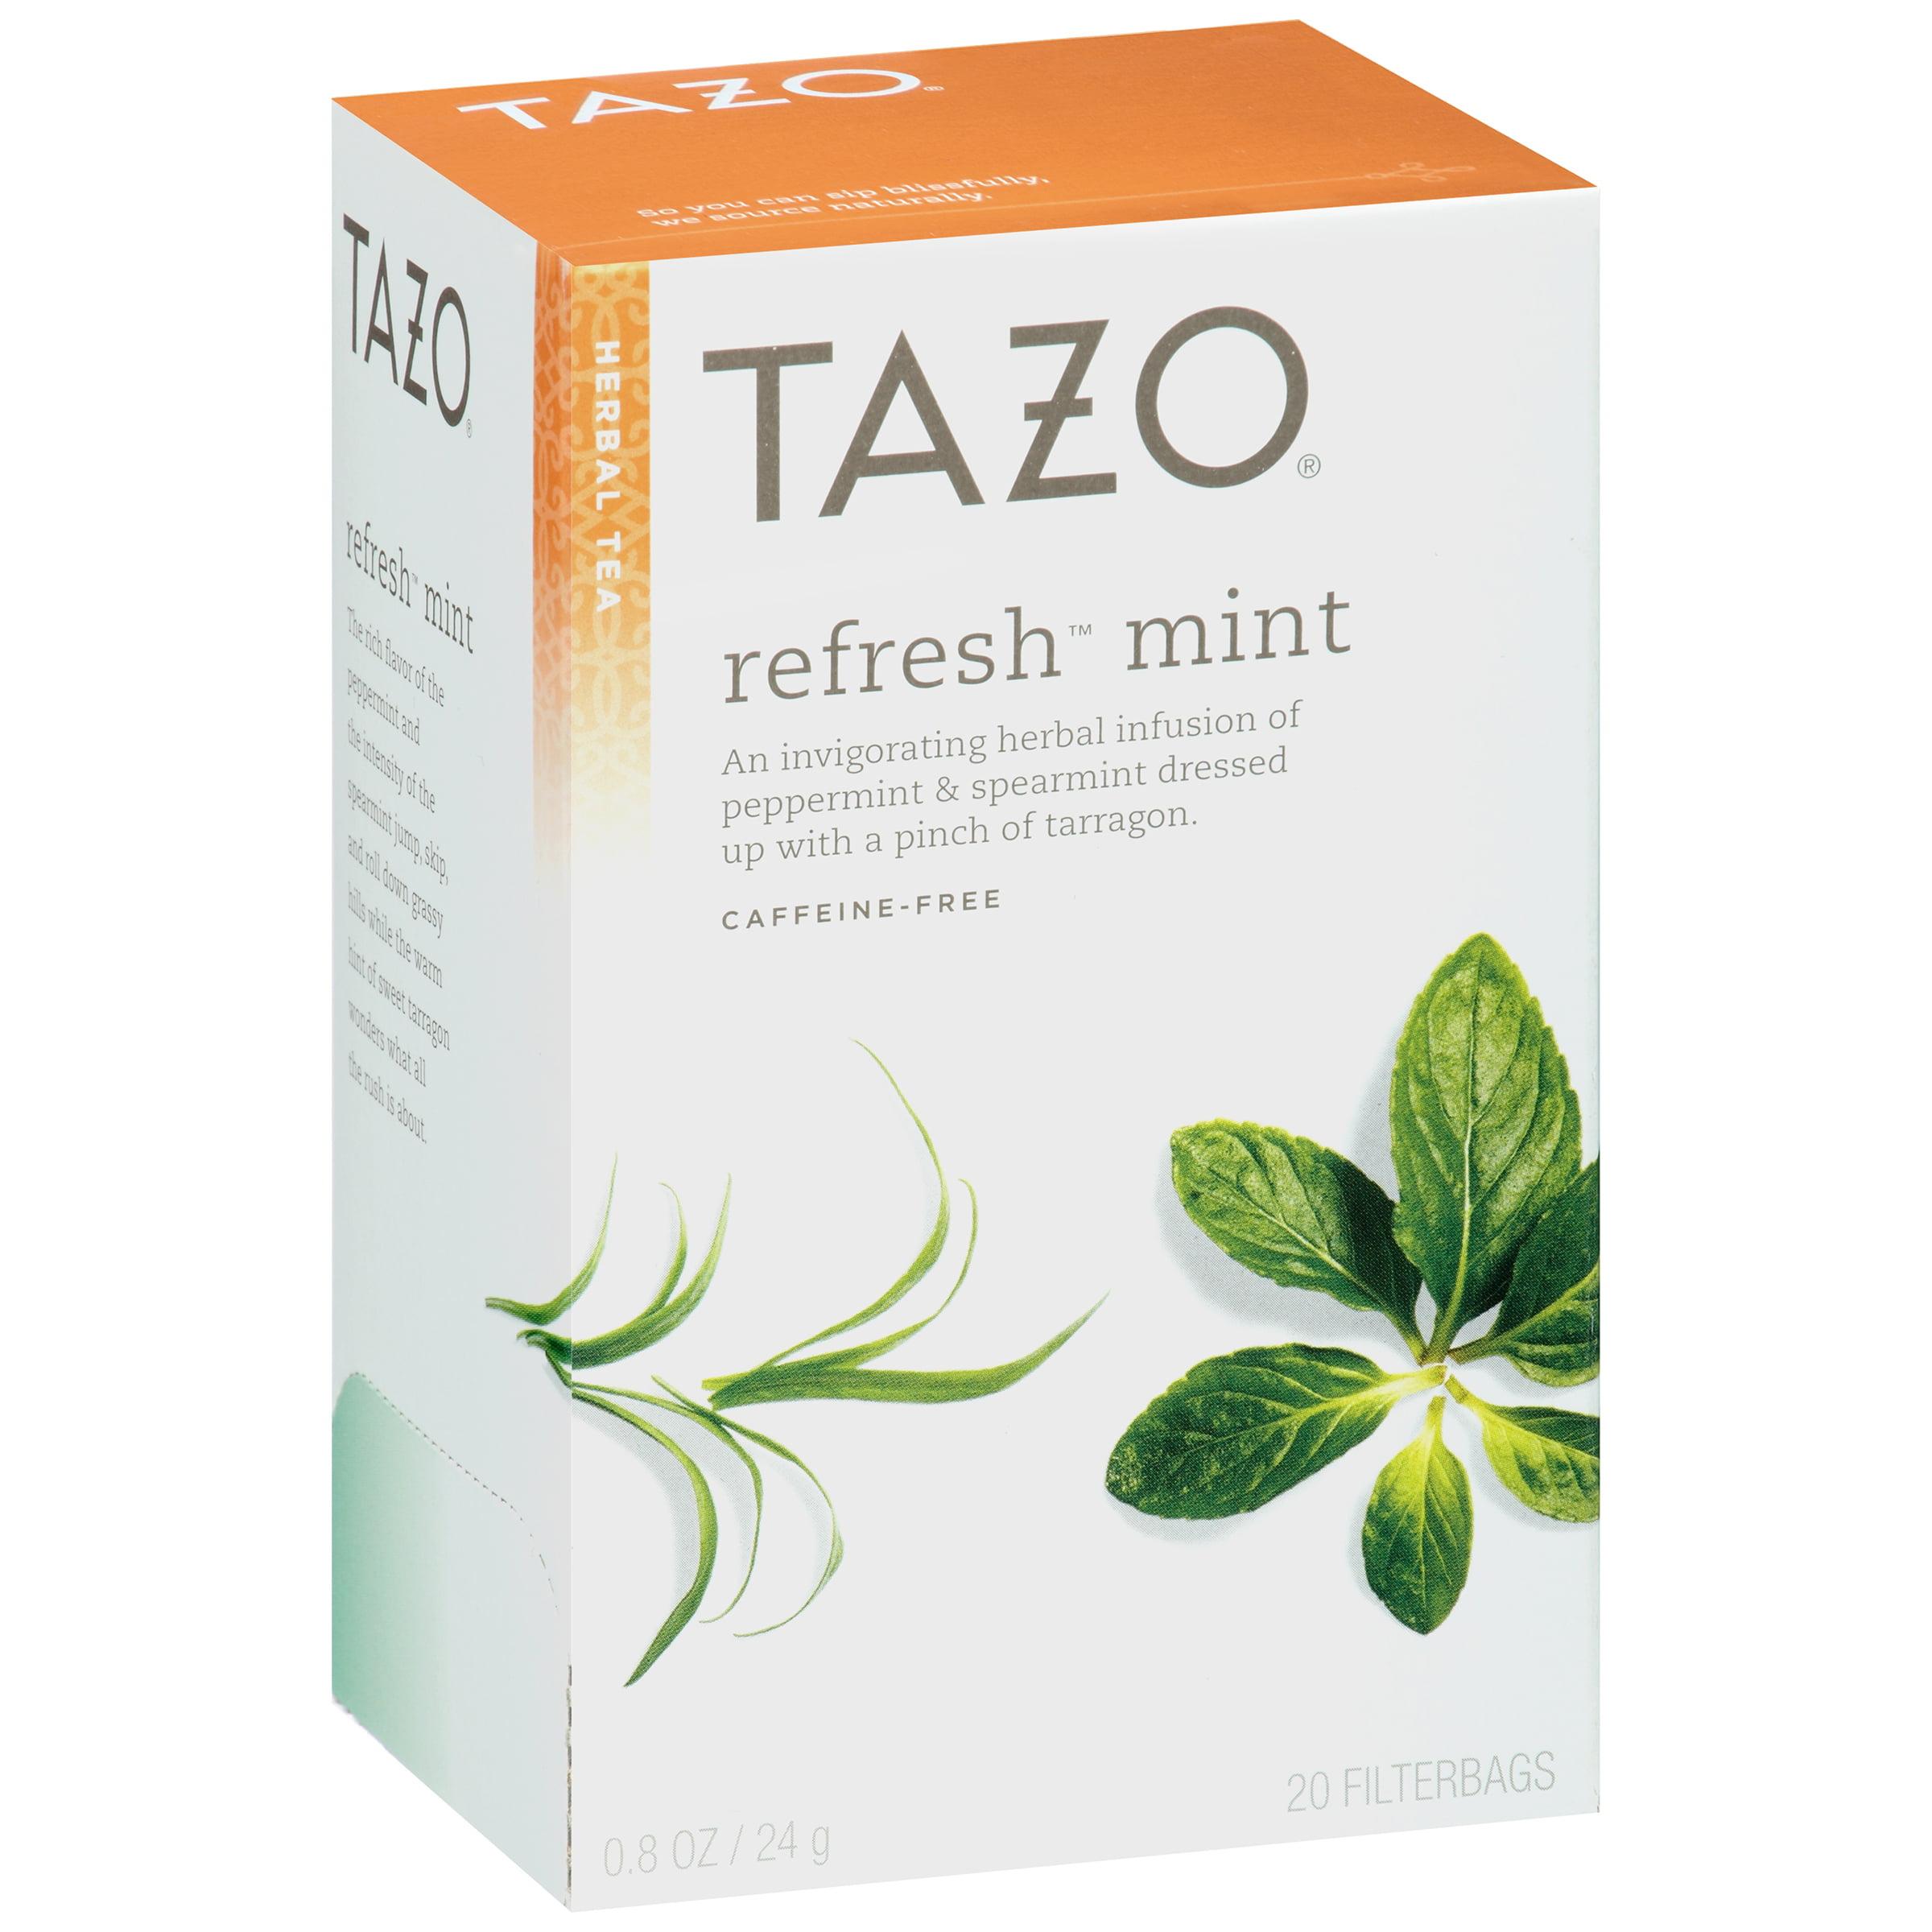 (3 Pack) Tazo Refresh Mint Tea bags Herbal Tea 20ct